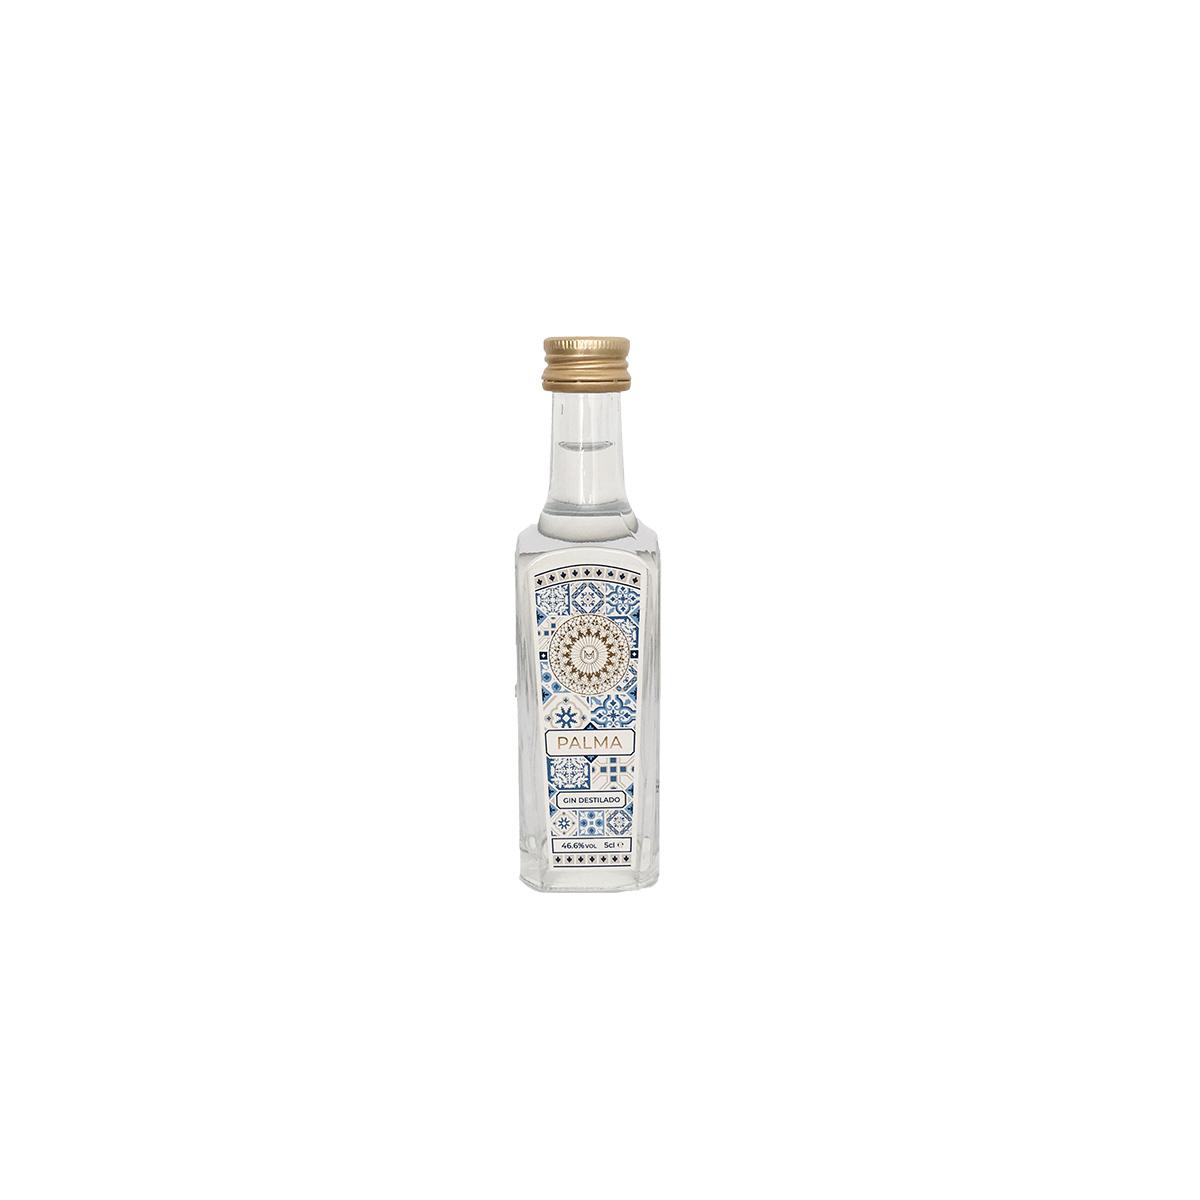 PALMA GIN - Probierflasche 5cl